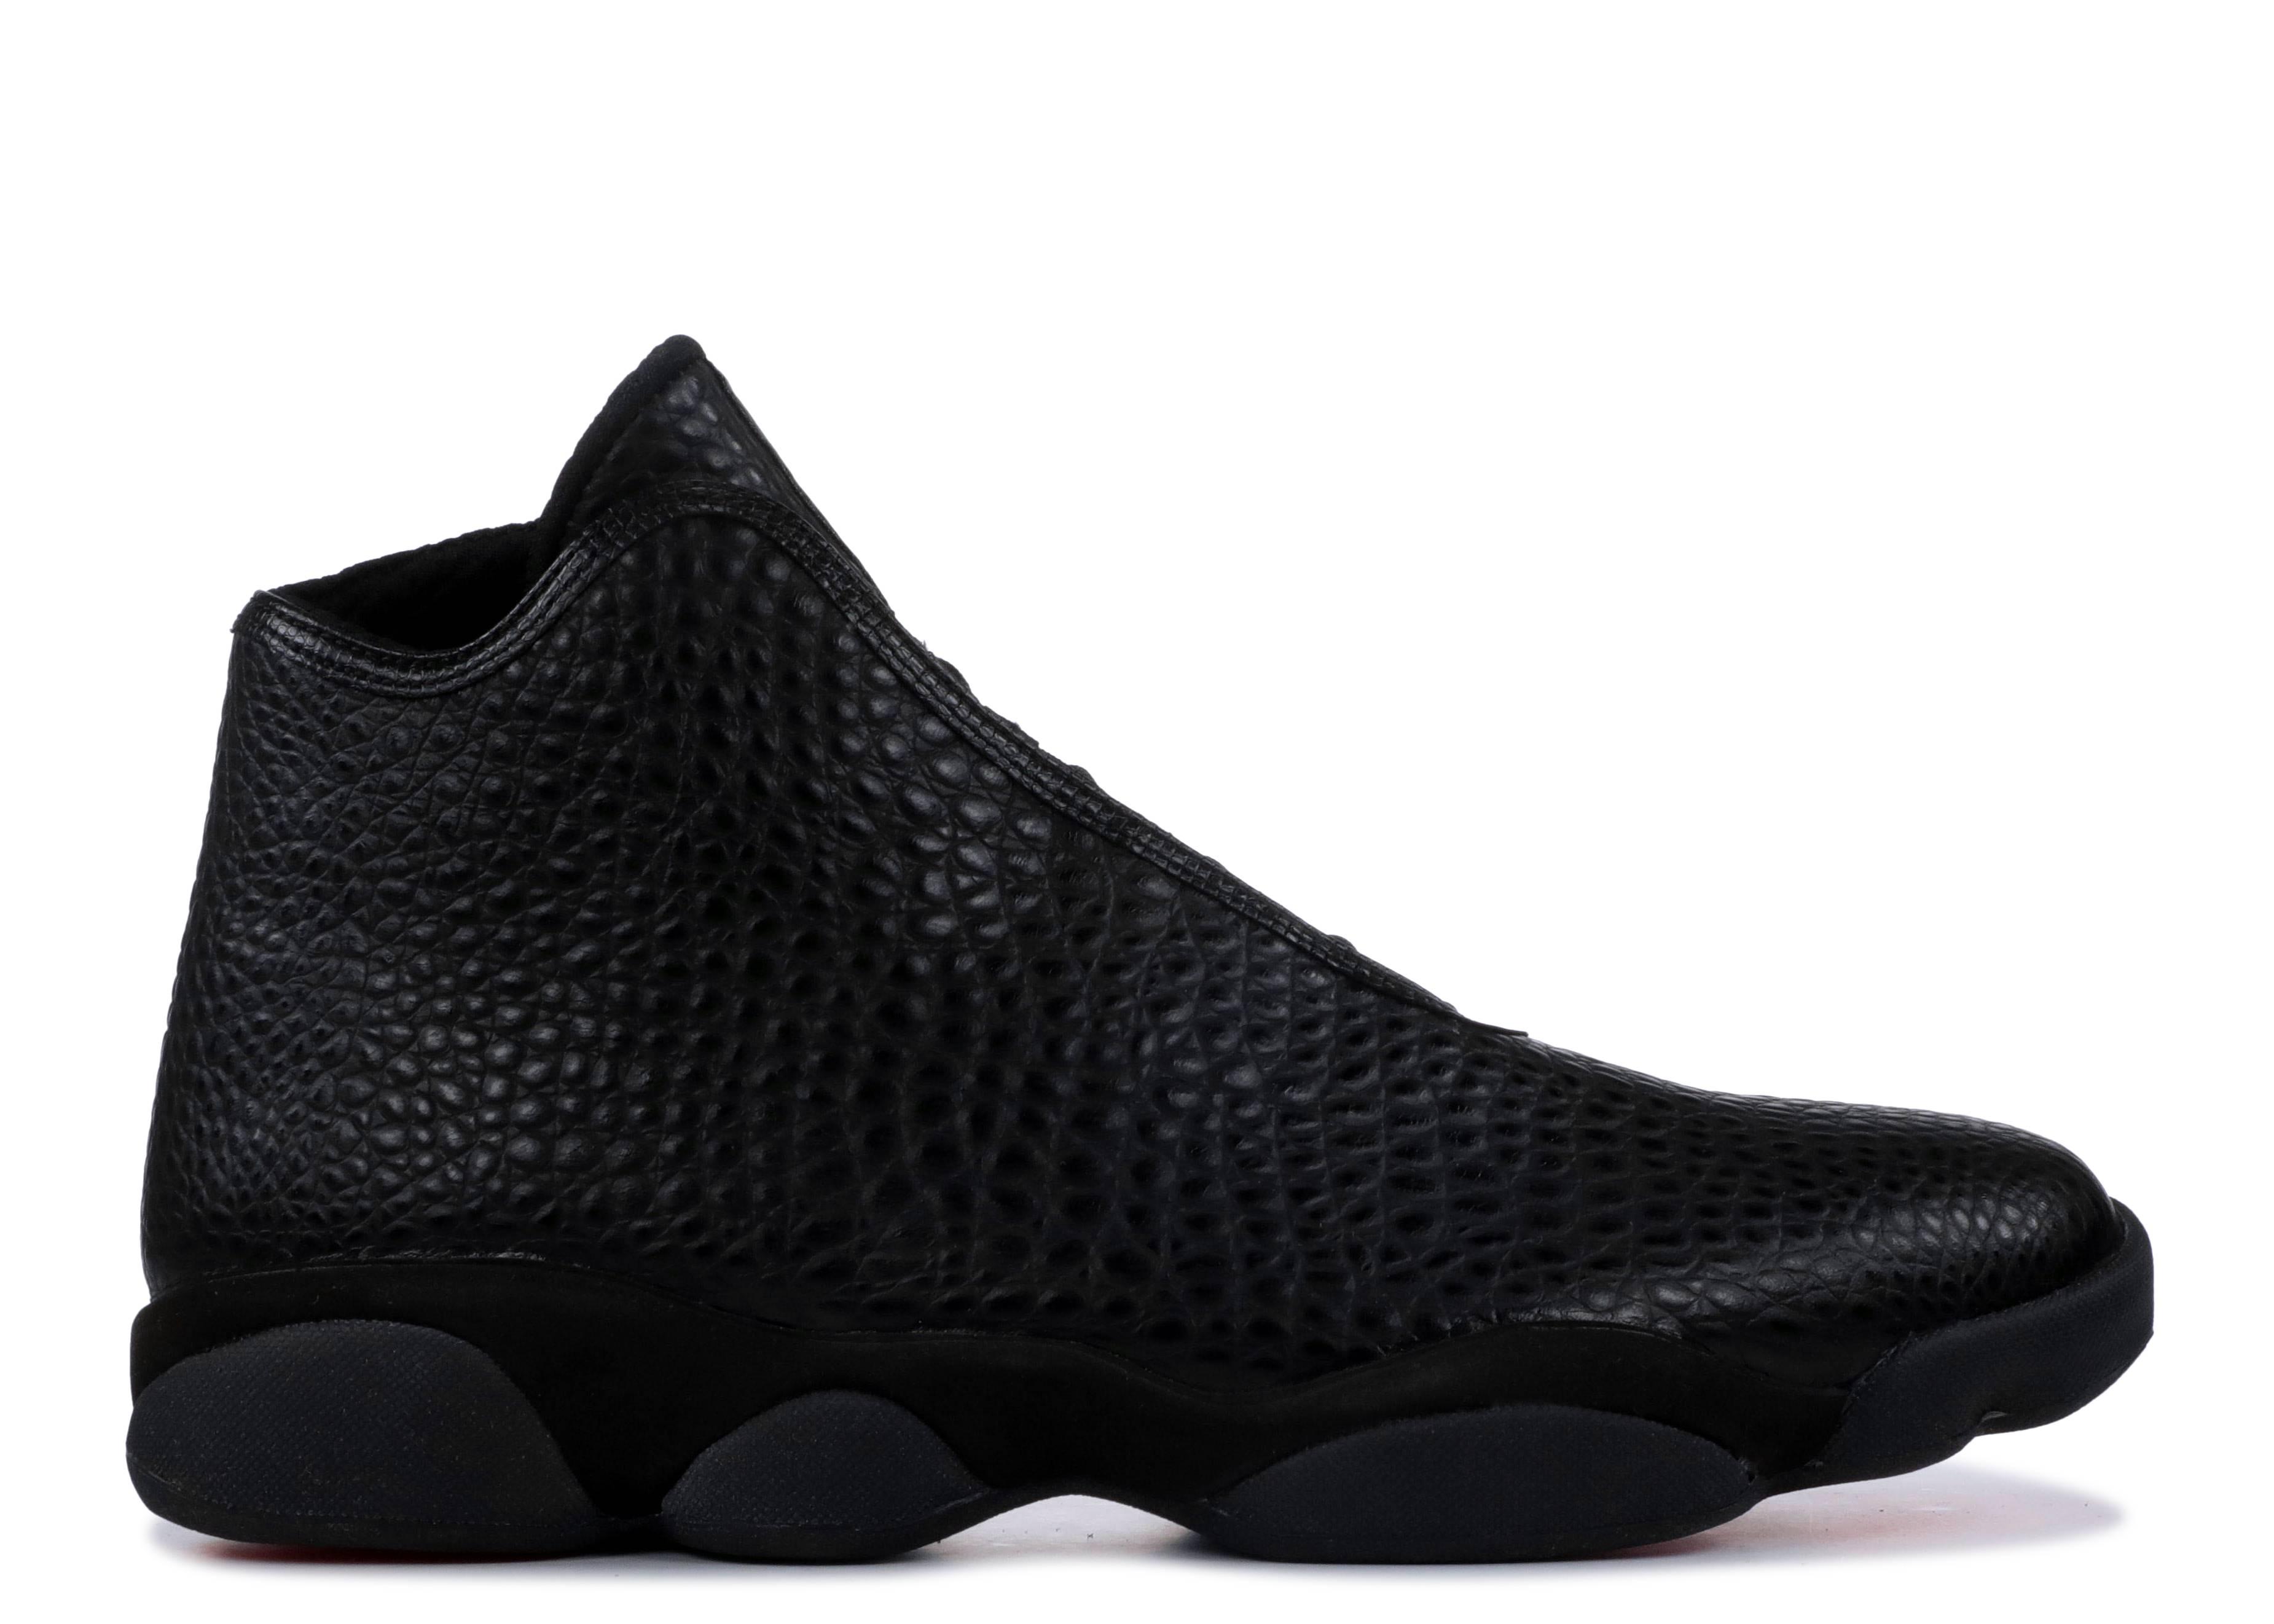 "Jordan Horizon Premium 'Black Croc' ""Black Croc"""